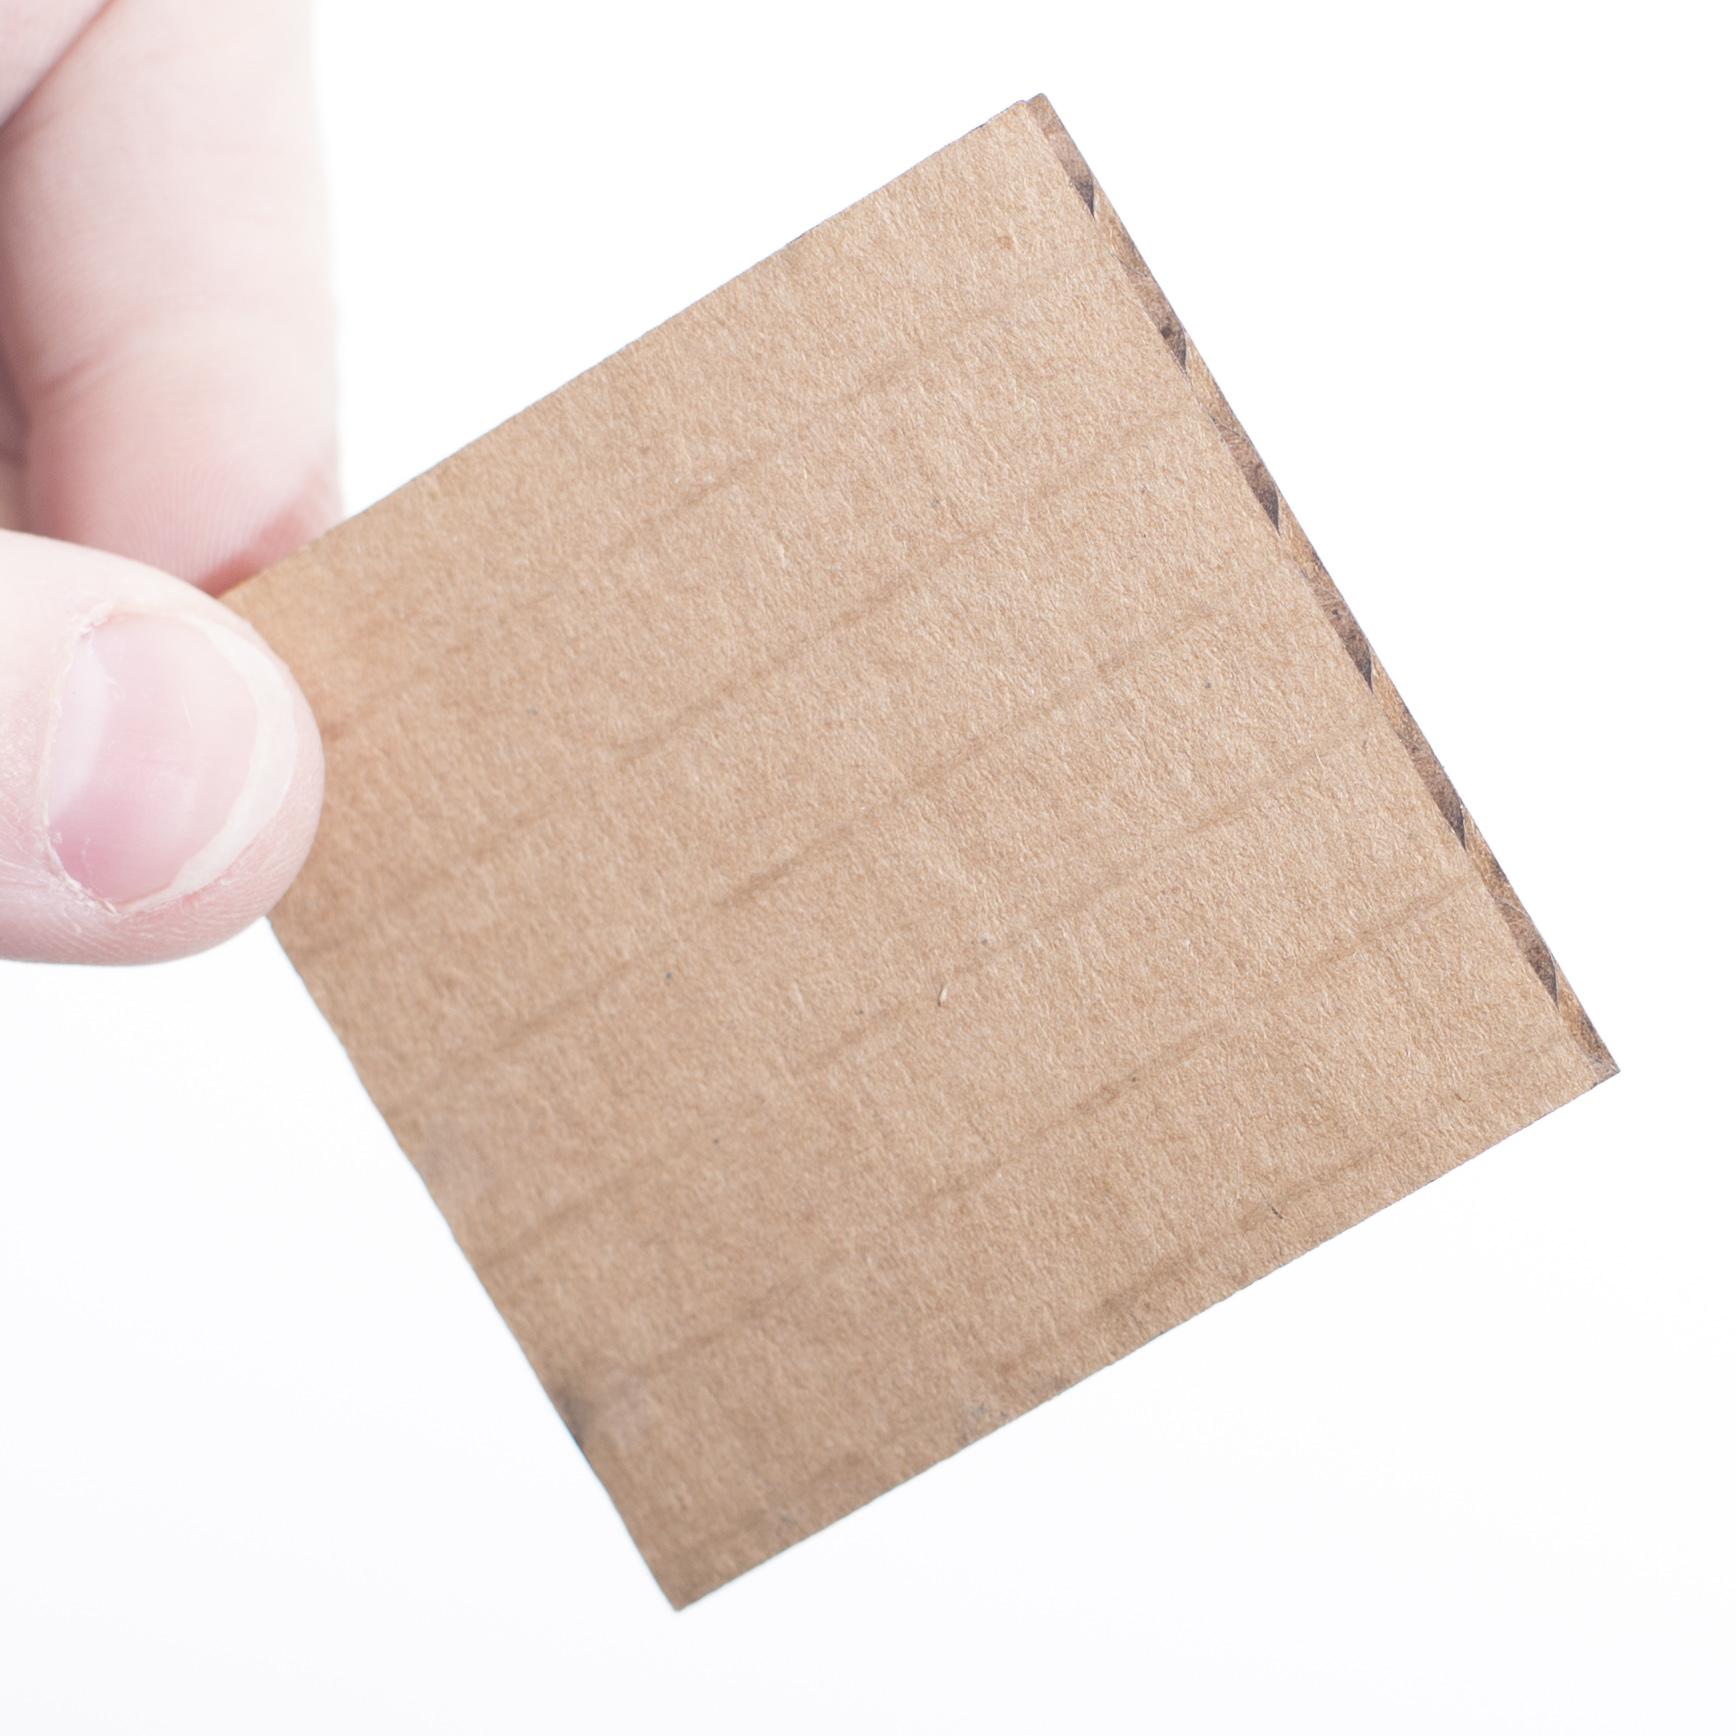 Laser Cut Cardboard sample square